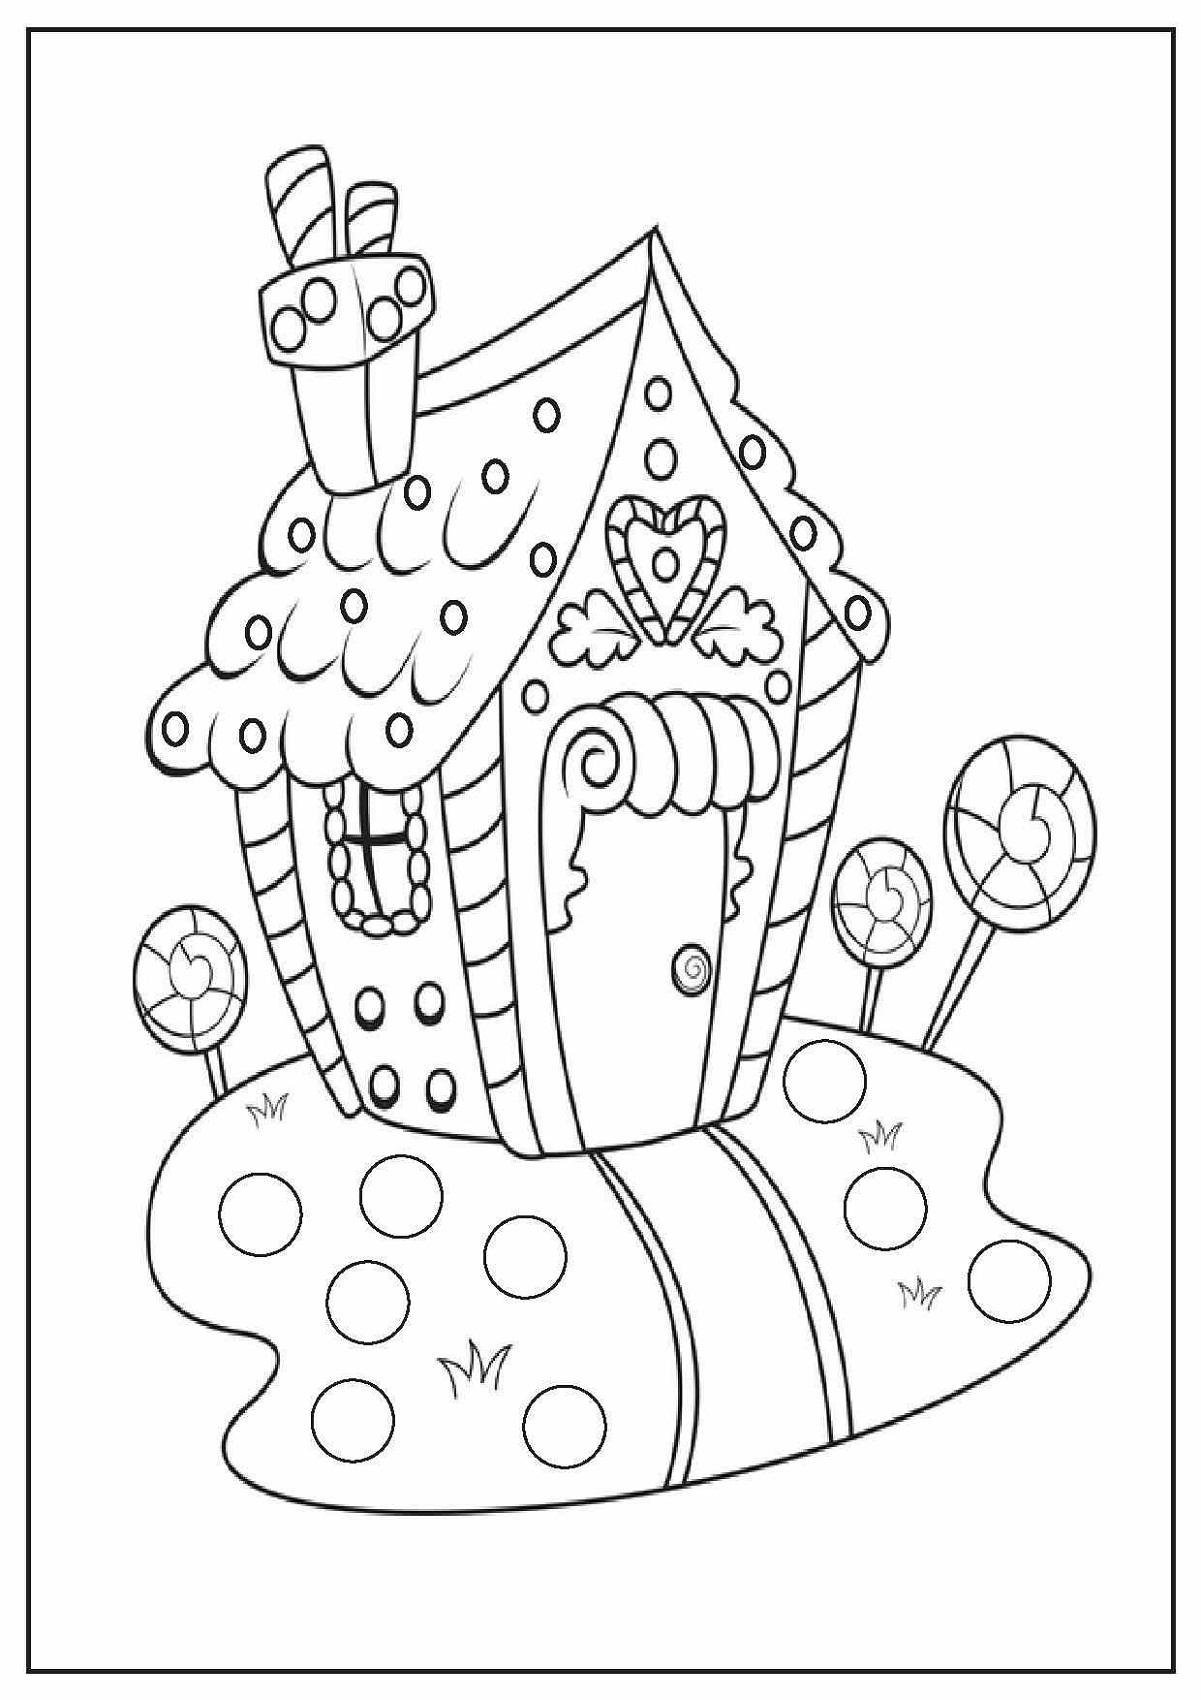 printable activity sheets coloring